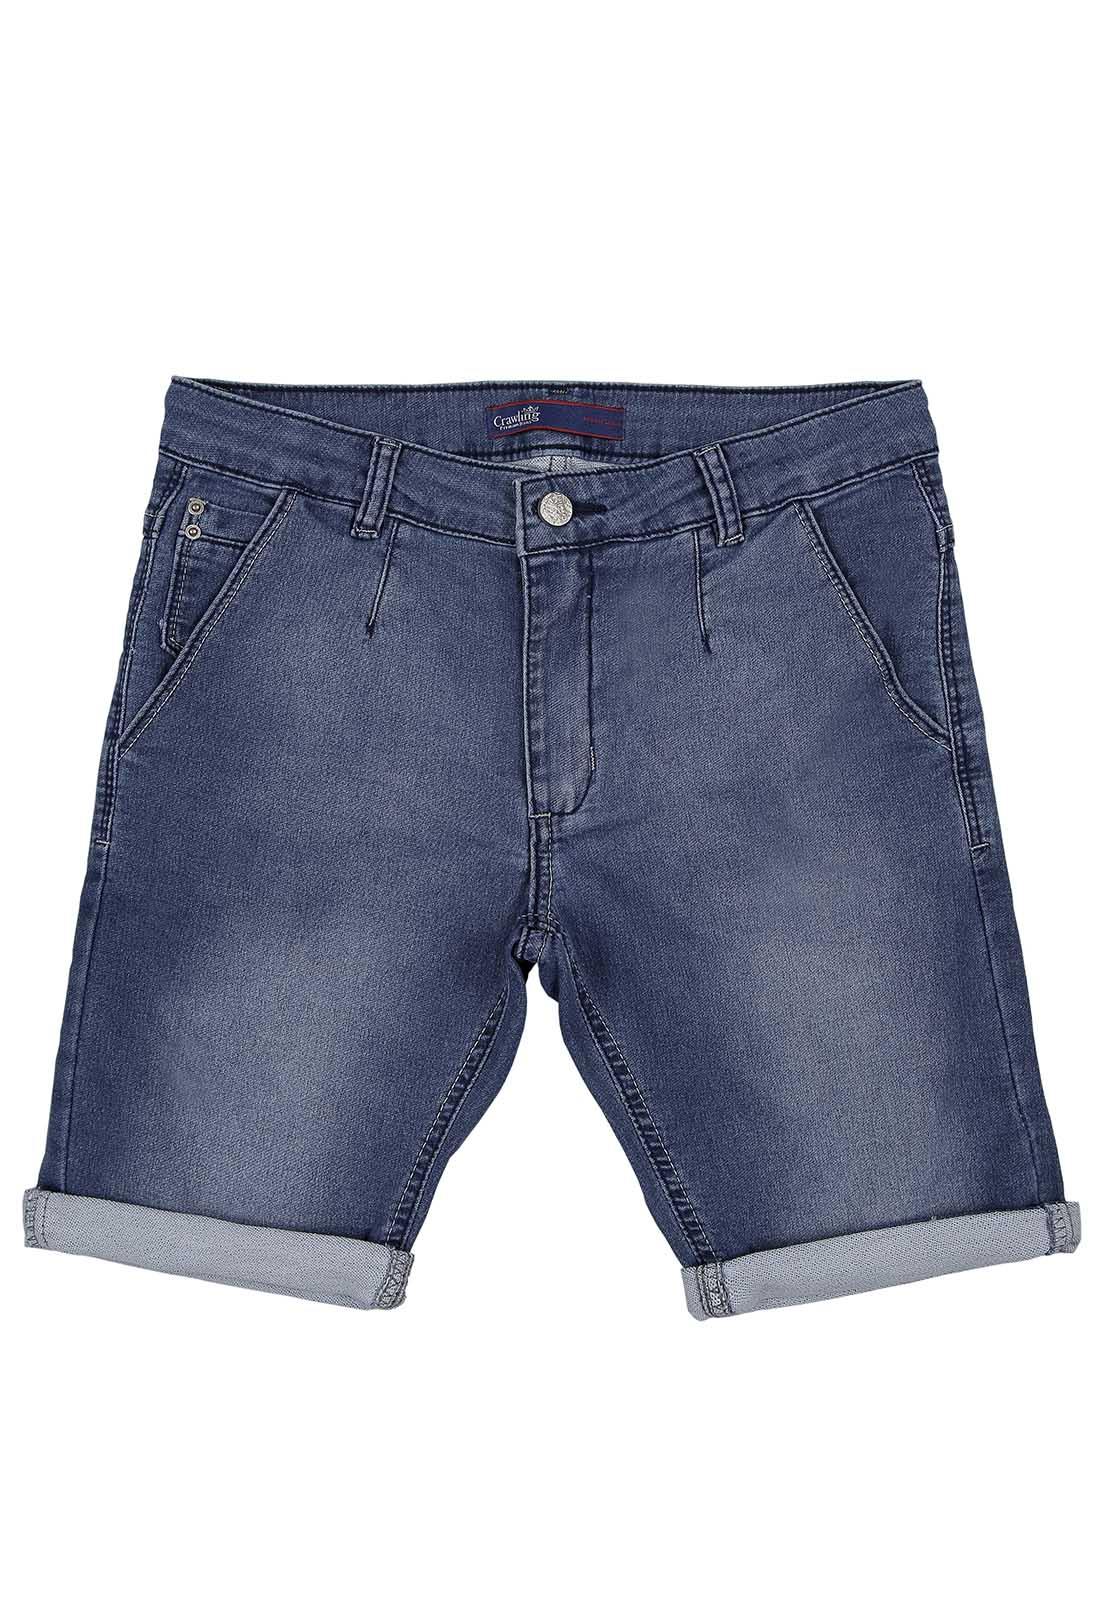 Bermuda Masculina Crawling Jeans